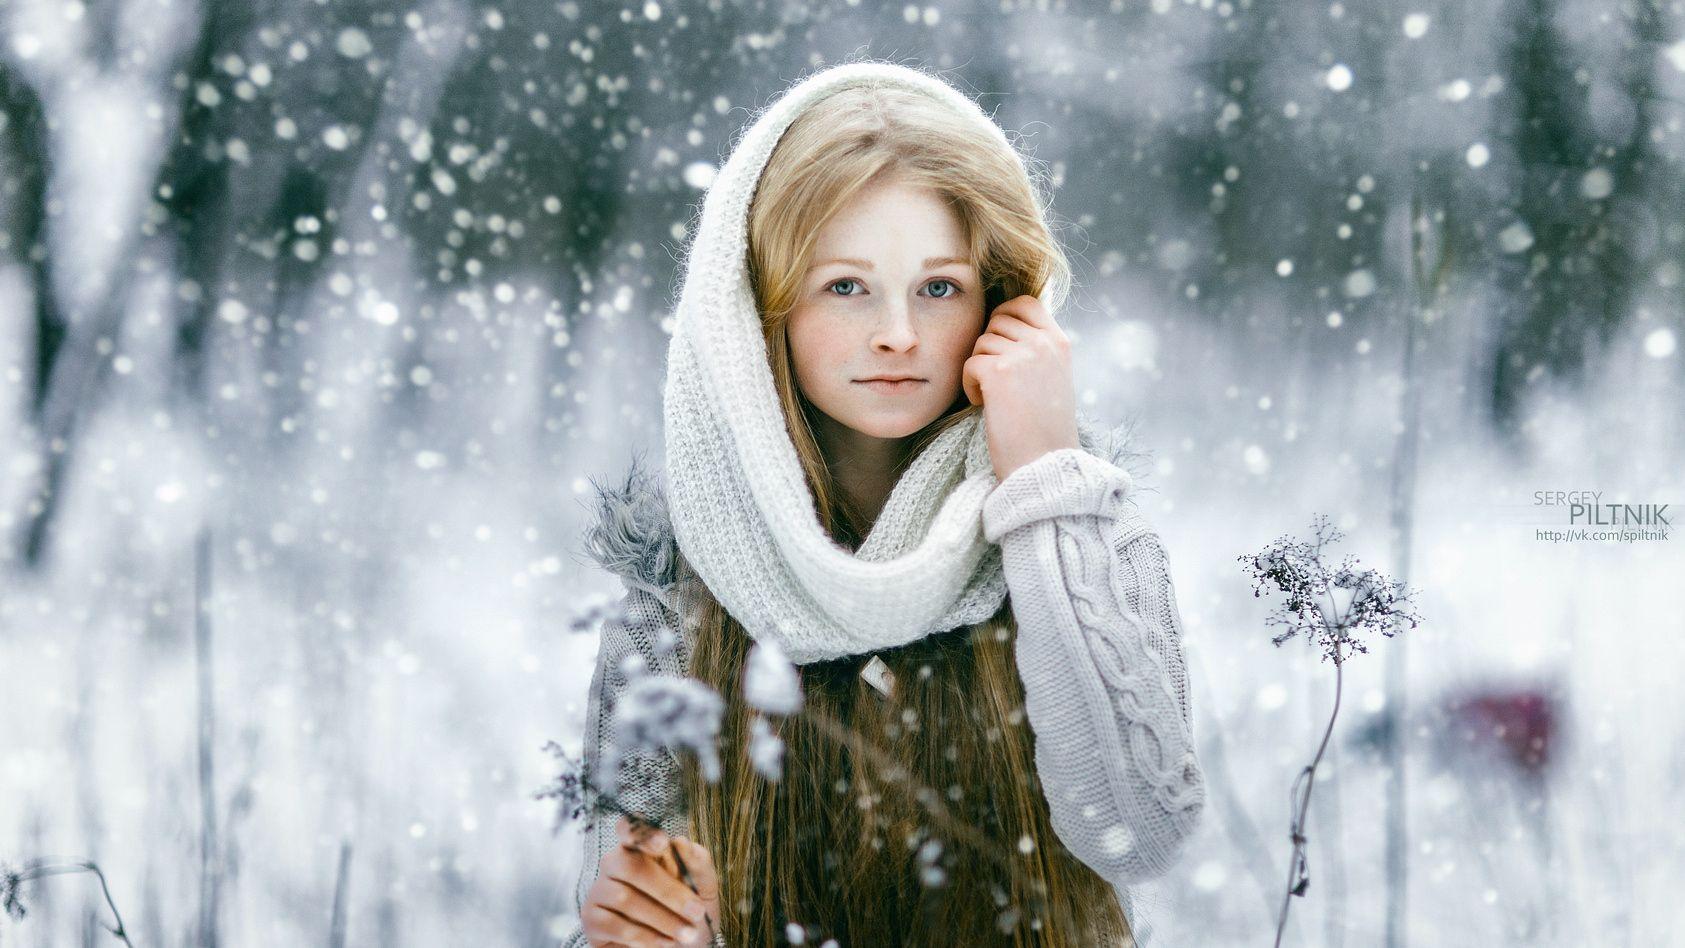 Song of snow - You can contact me on social networks/Вы можете связаться со мной в социальных сетях: Одноклассники http://ok.ru/profile/558608940164 ВКонтакте https://vk.com/spiltnik Фотокто http://fotokto.ru/id15762/photo Instagram https://instagram.com/spiltnik/ piltnik.photosight.ru 500px https://500px.com/pfotograf